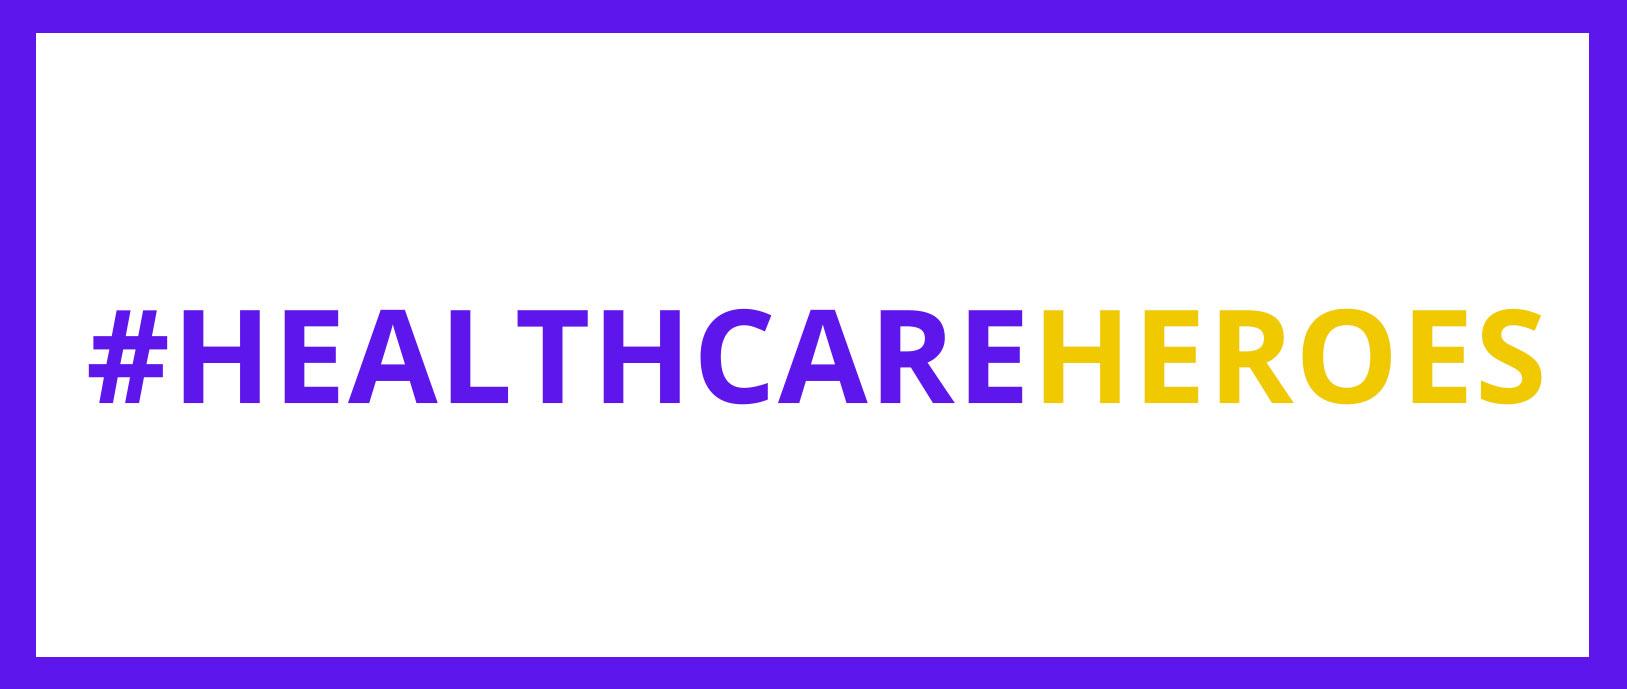 #HEALTHCAREHEROES